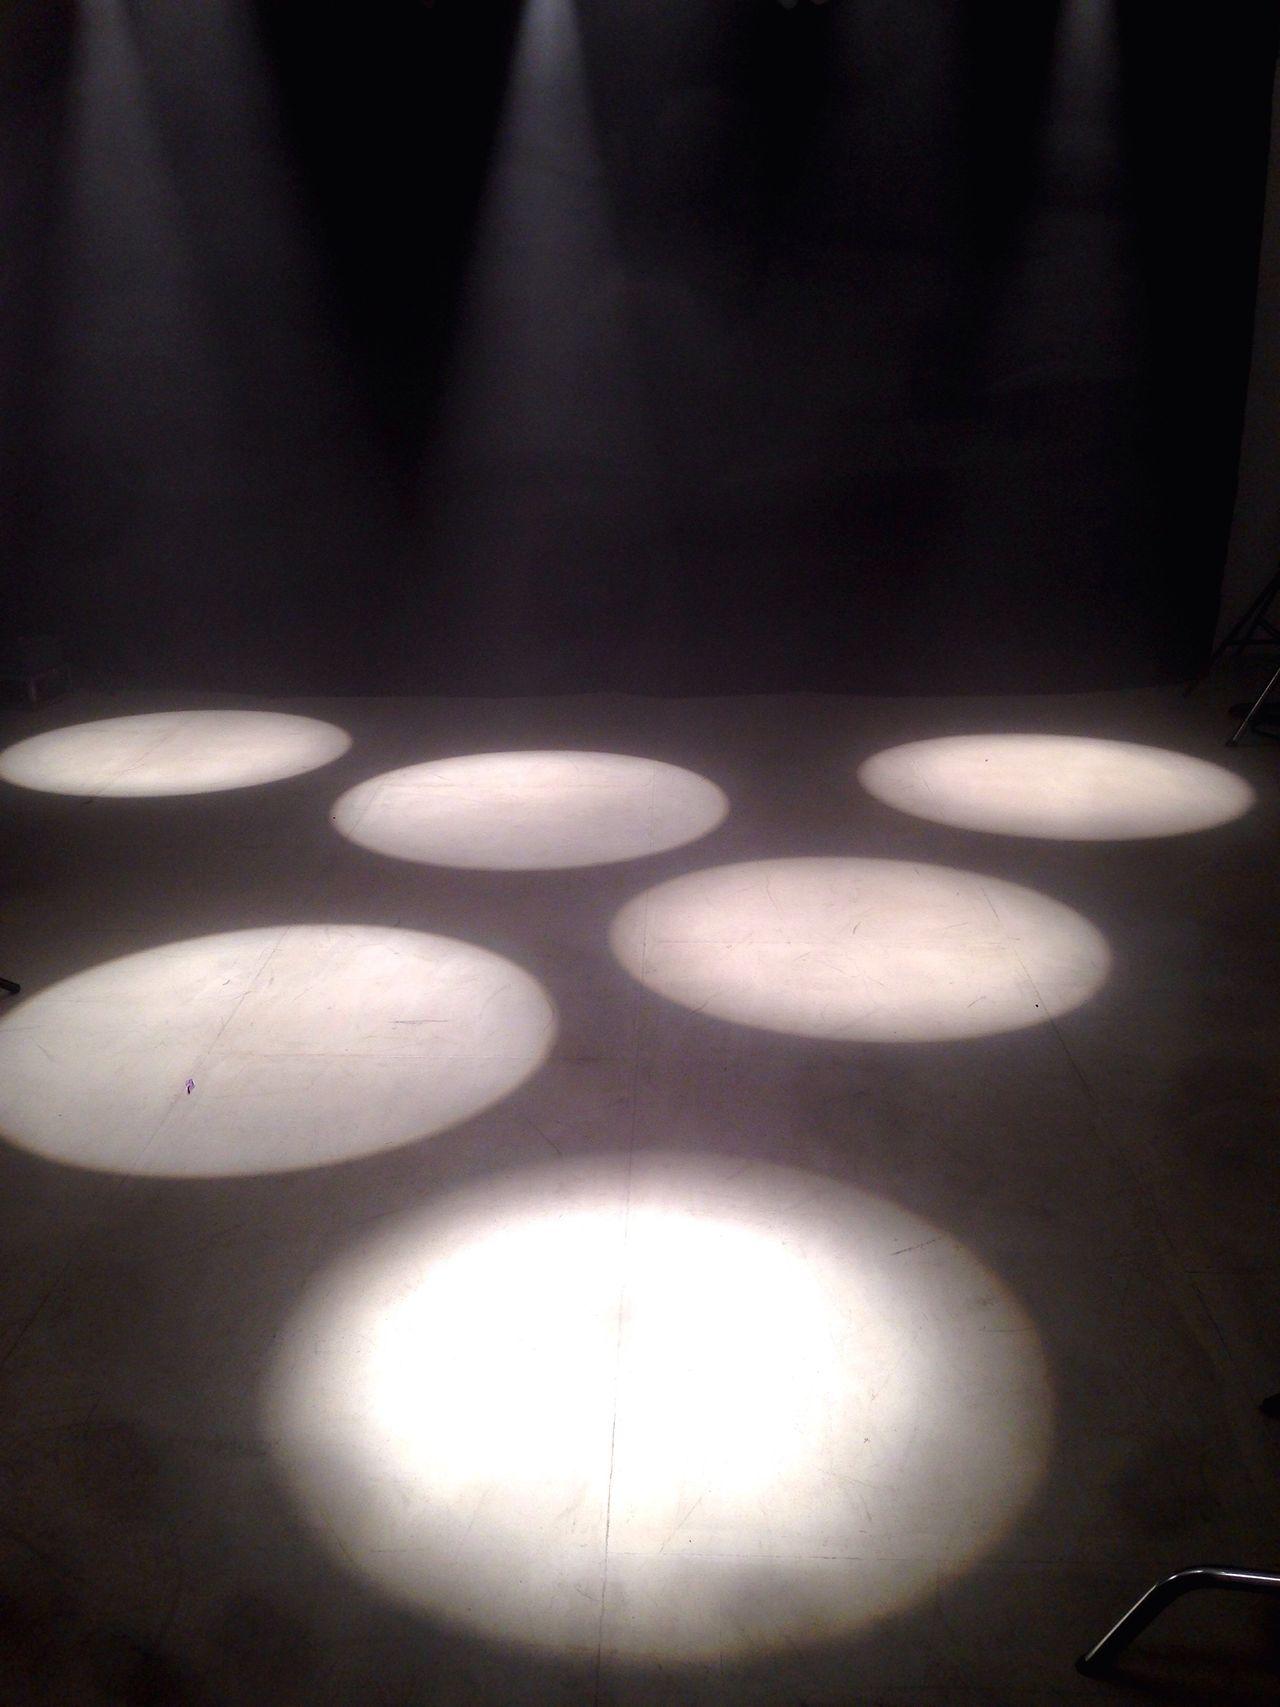 Spotlight Light And Shadow Blackandwhite Circle Illuminated No People Indoors  Electricity  Dark Headlight Spots Light